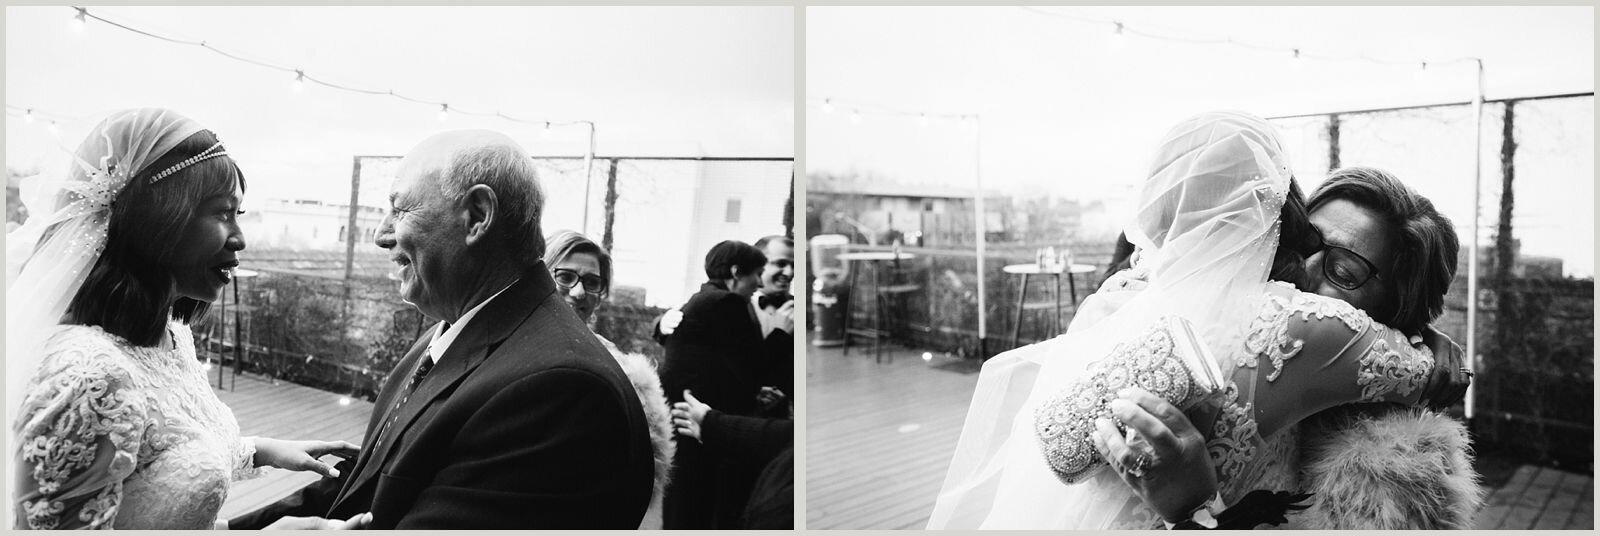 joseph_koprek_wedding_melbourne_the_prince_deck_0069.jpg